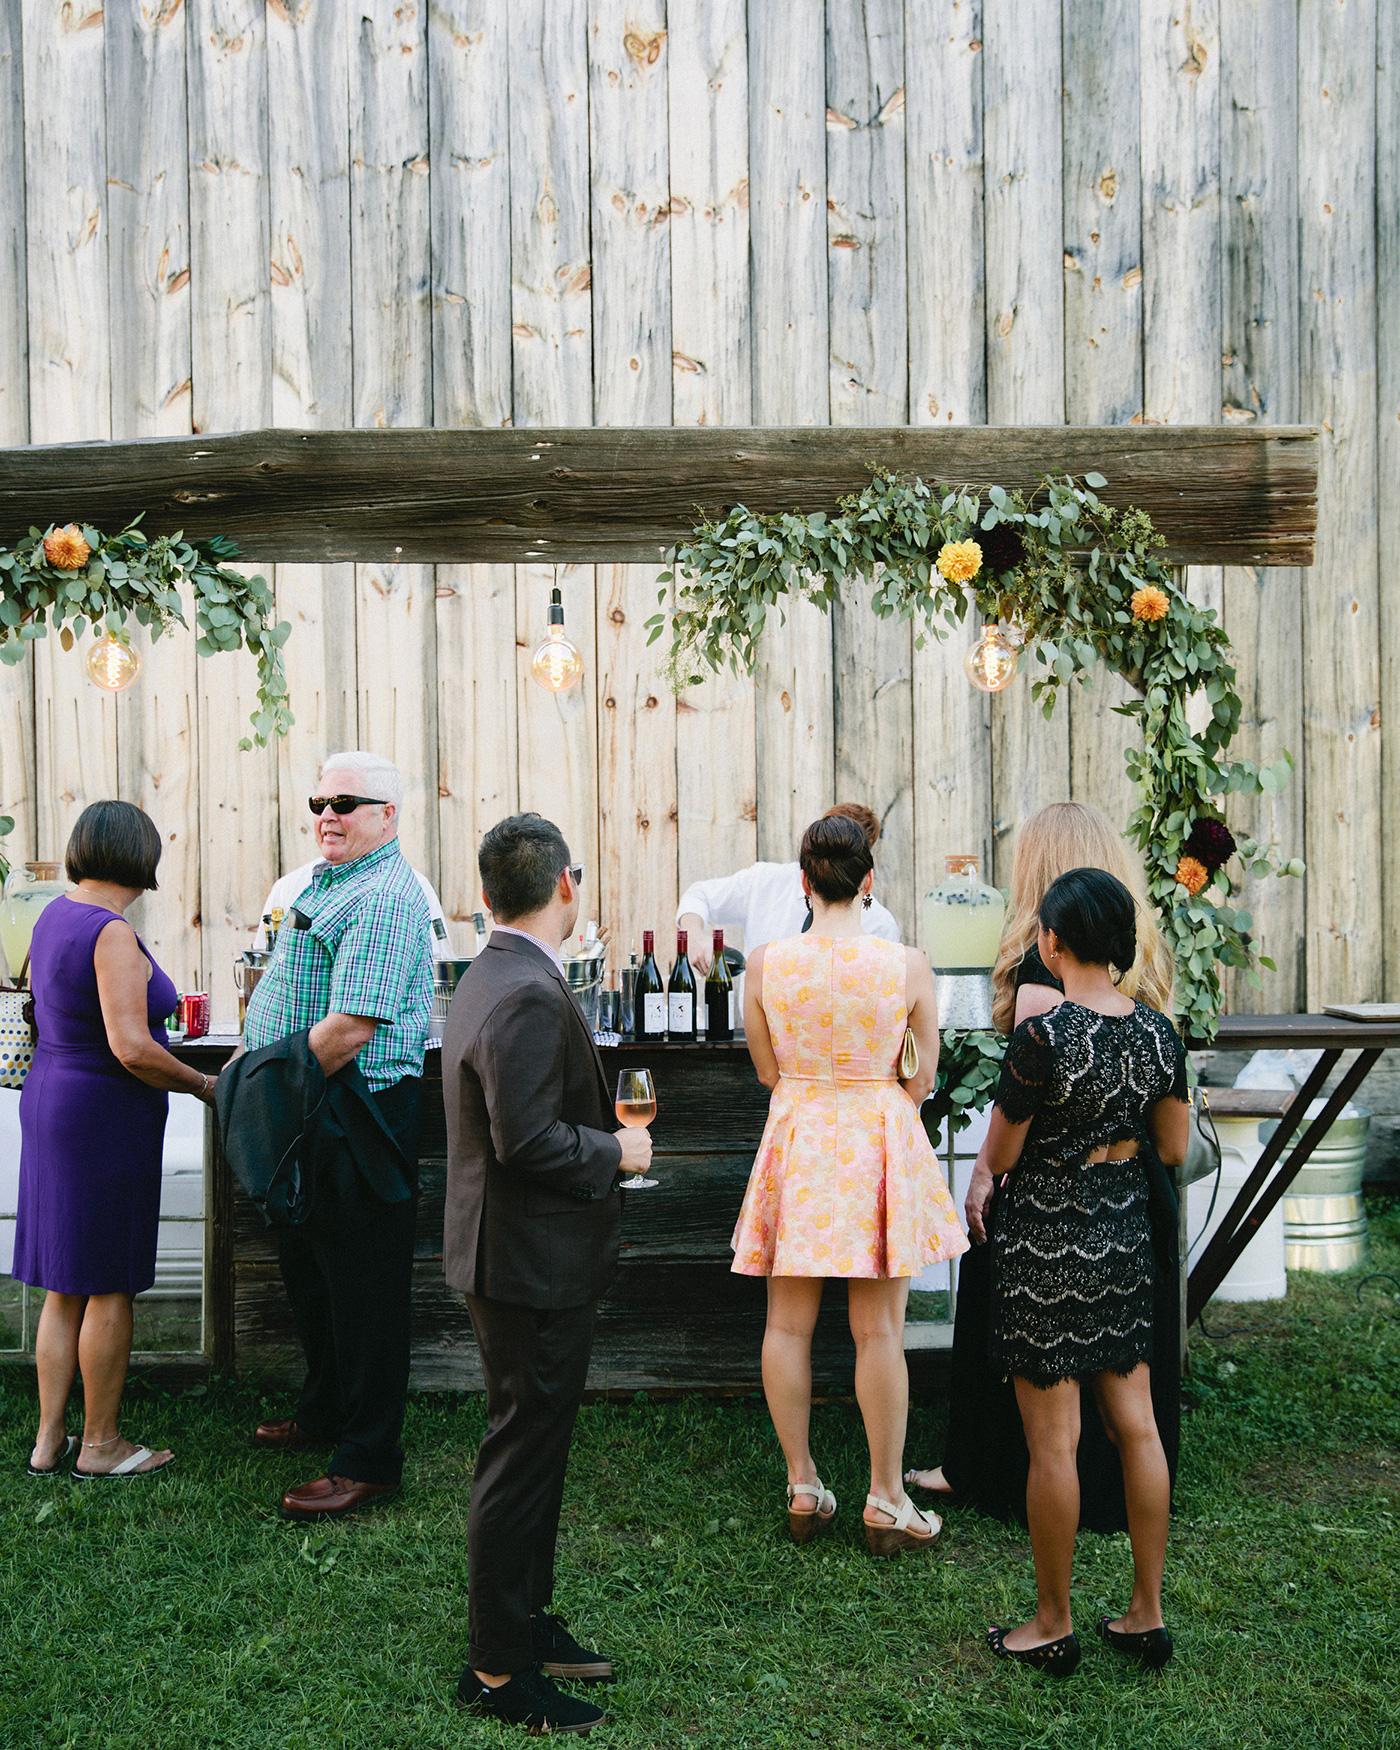 jesse-nate-wedding-bar-0566-s113063-0716.jpg